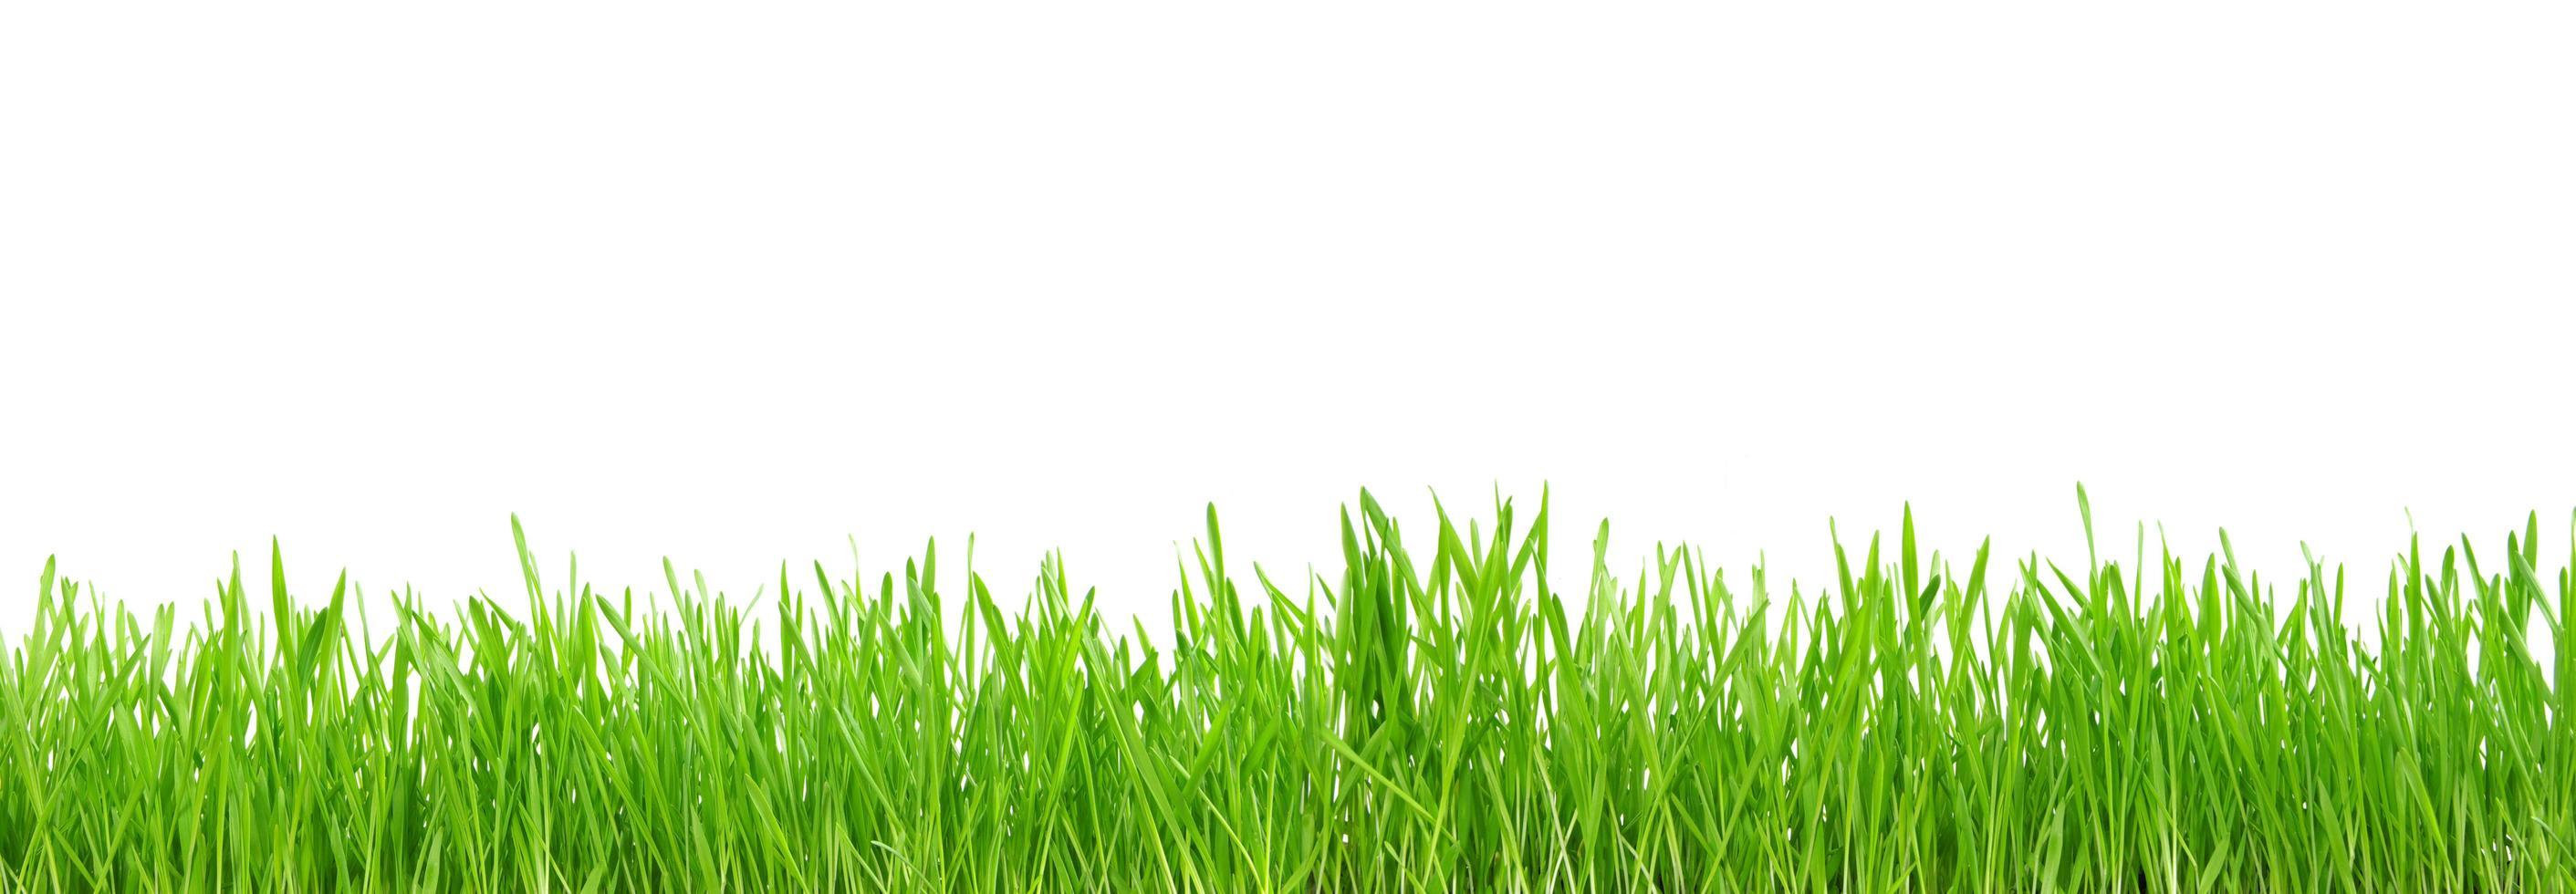 pasto verde aislado sobre fondo blanco foto